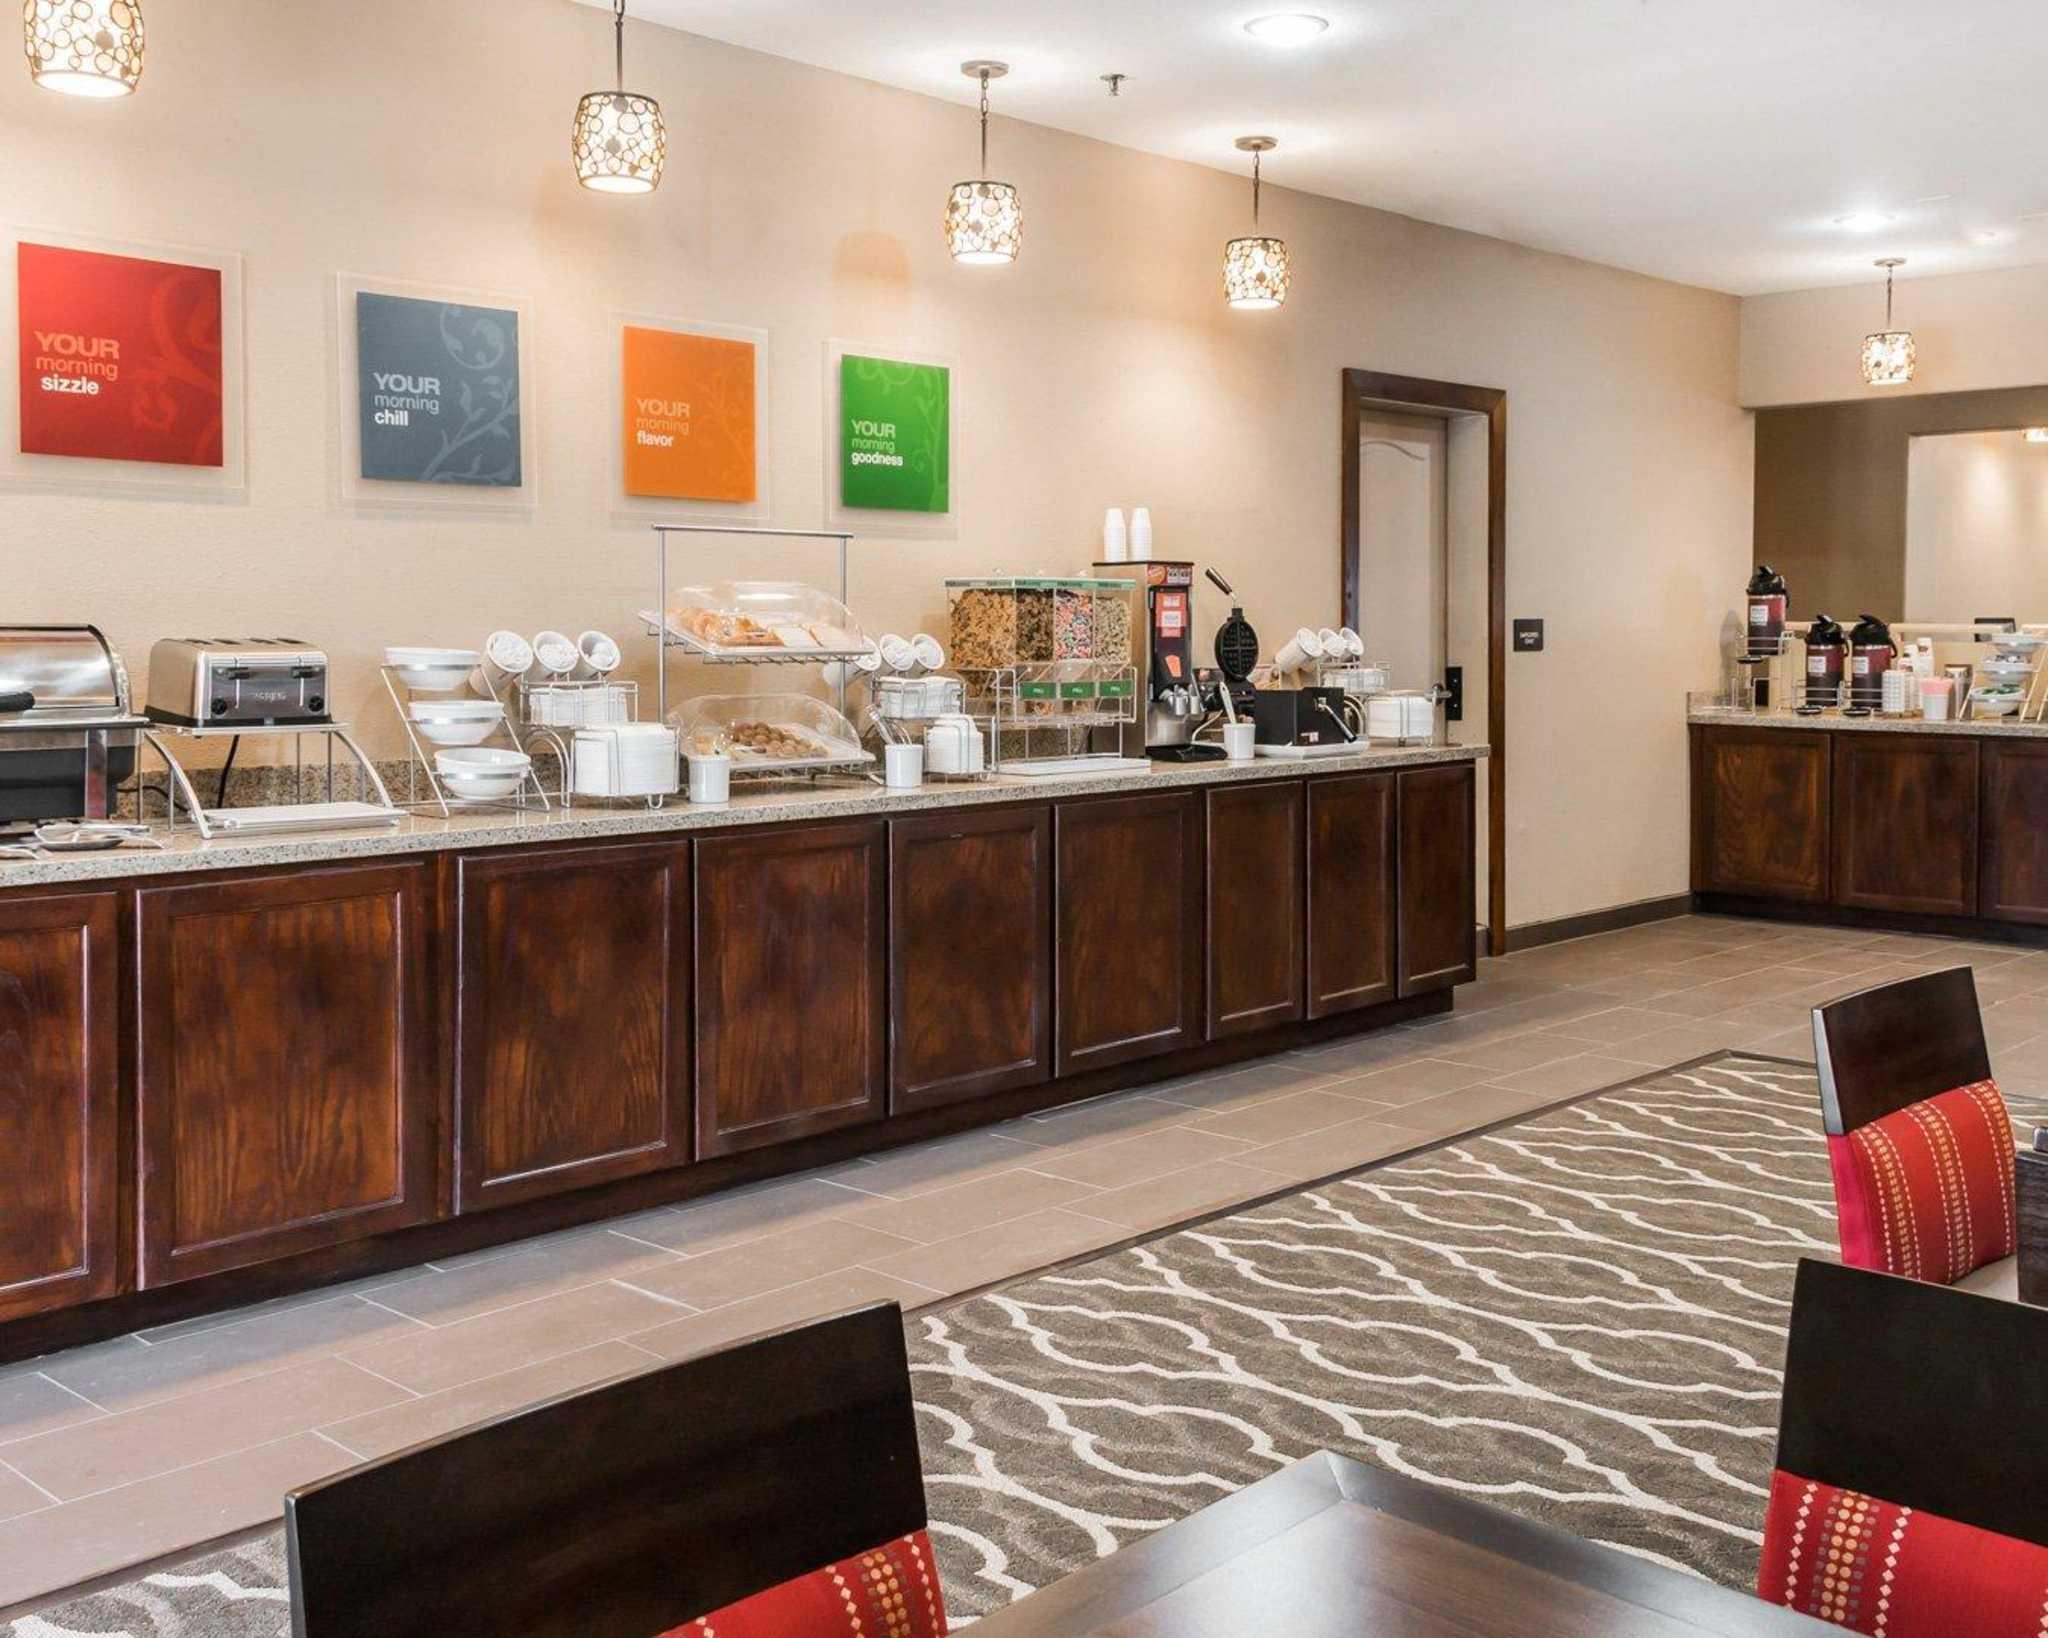 Comfort Inn & Suites image 22